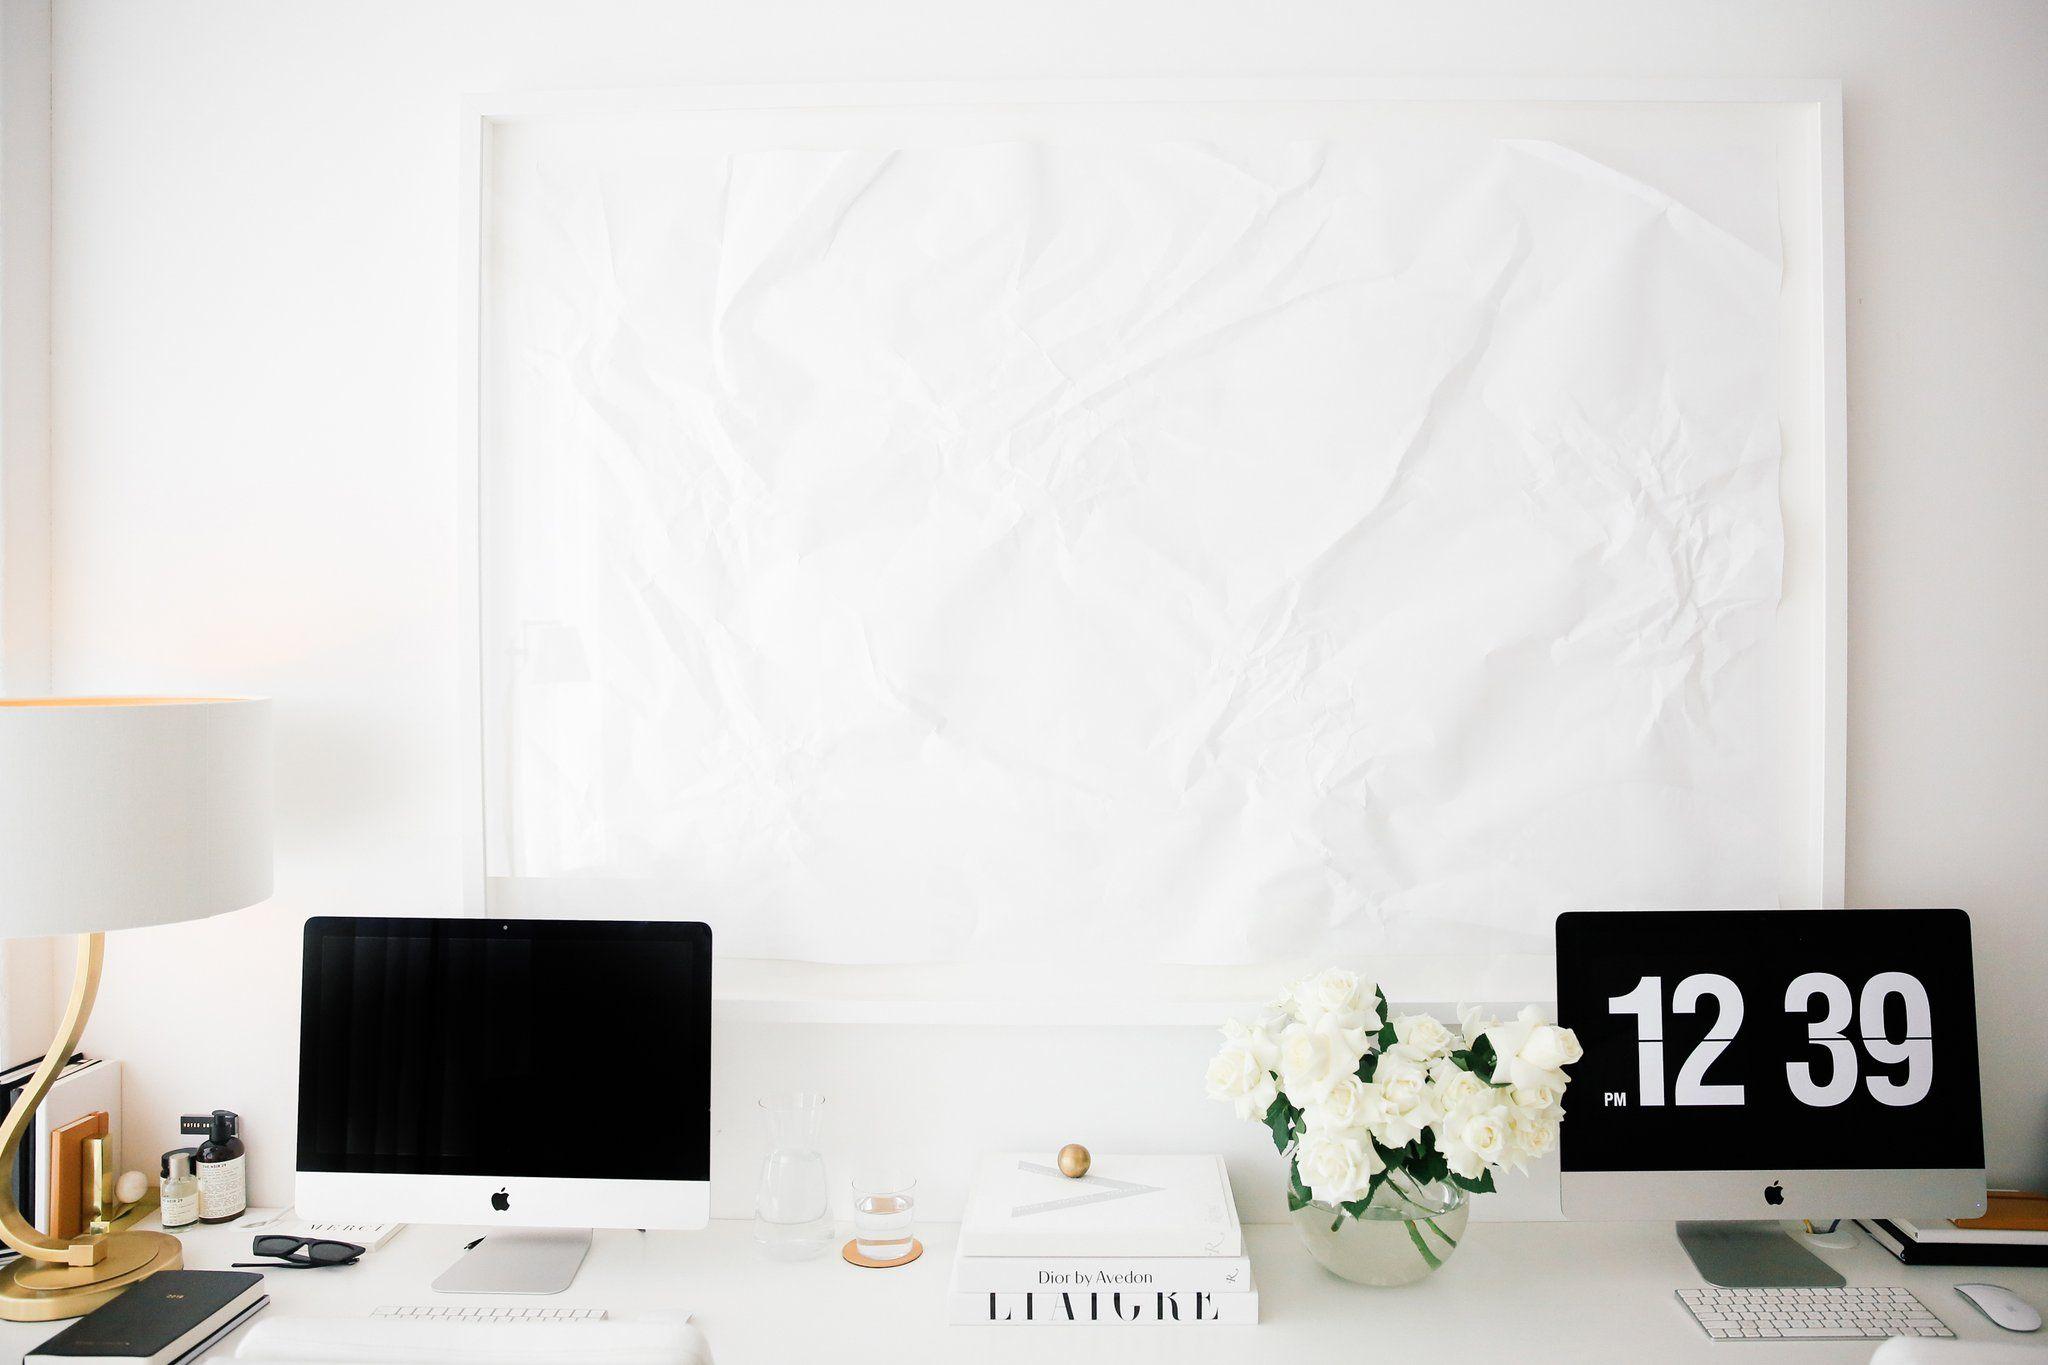 An Organised Life With Hayley Bonham Founder Of La Porte Space Bonel Pr Maison D Amore Office Inspiration Life Organization Office Nook